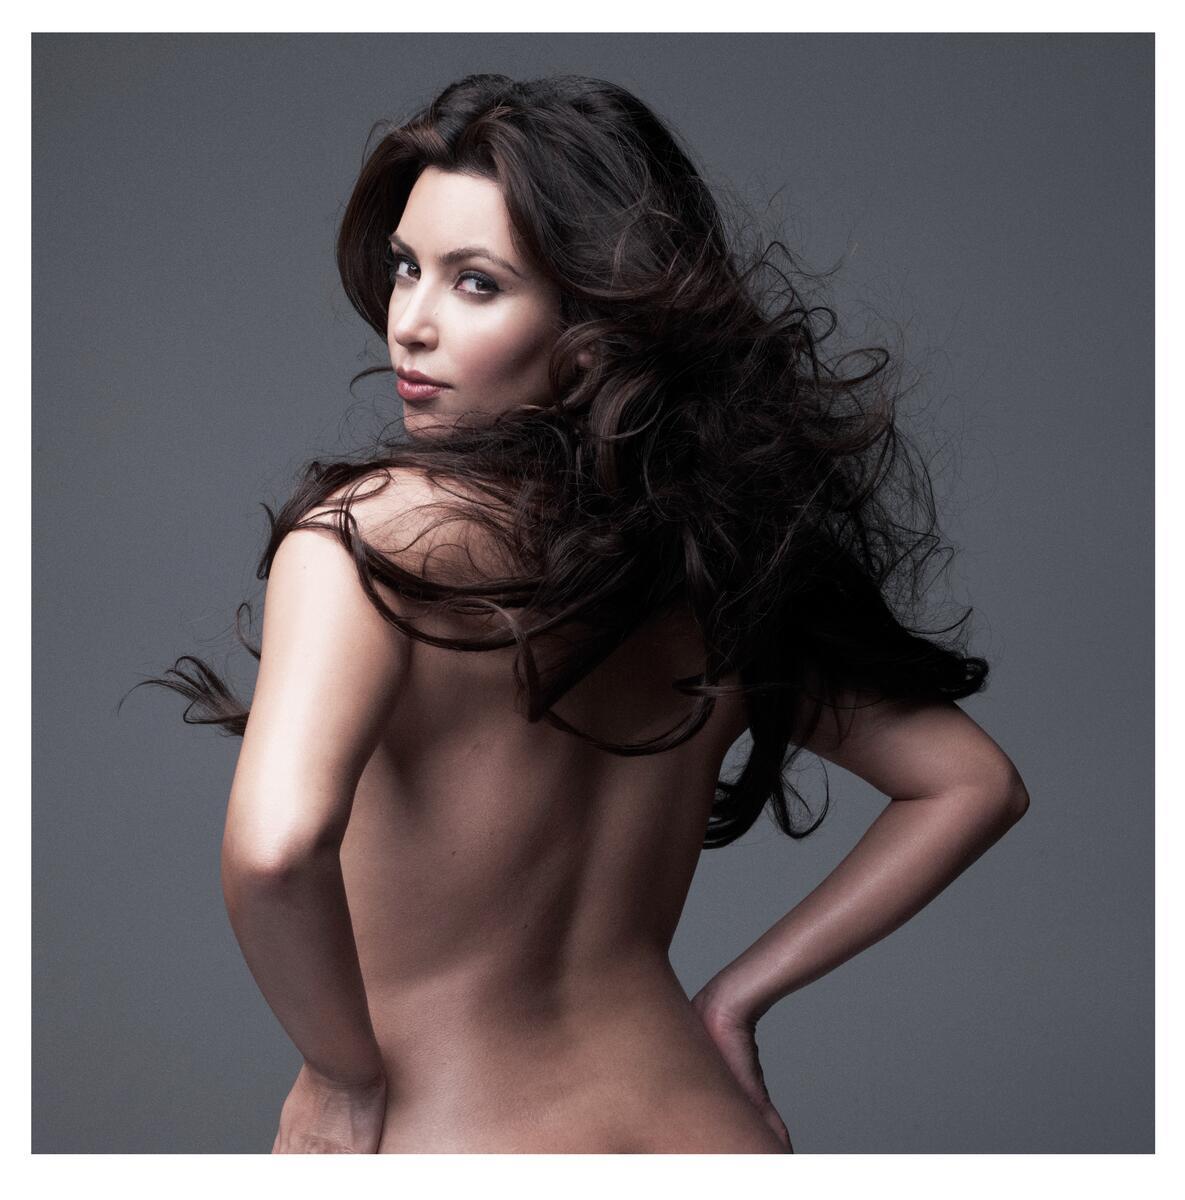 Kim Kardashian Nude Body Paint Photoshoot Leaked Jwrhss